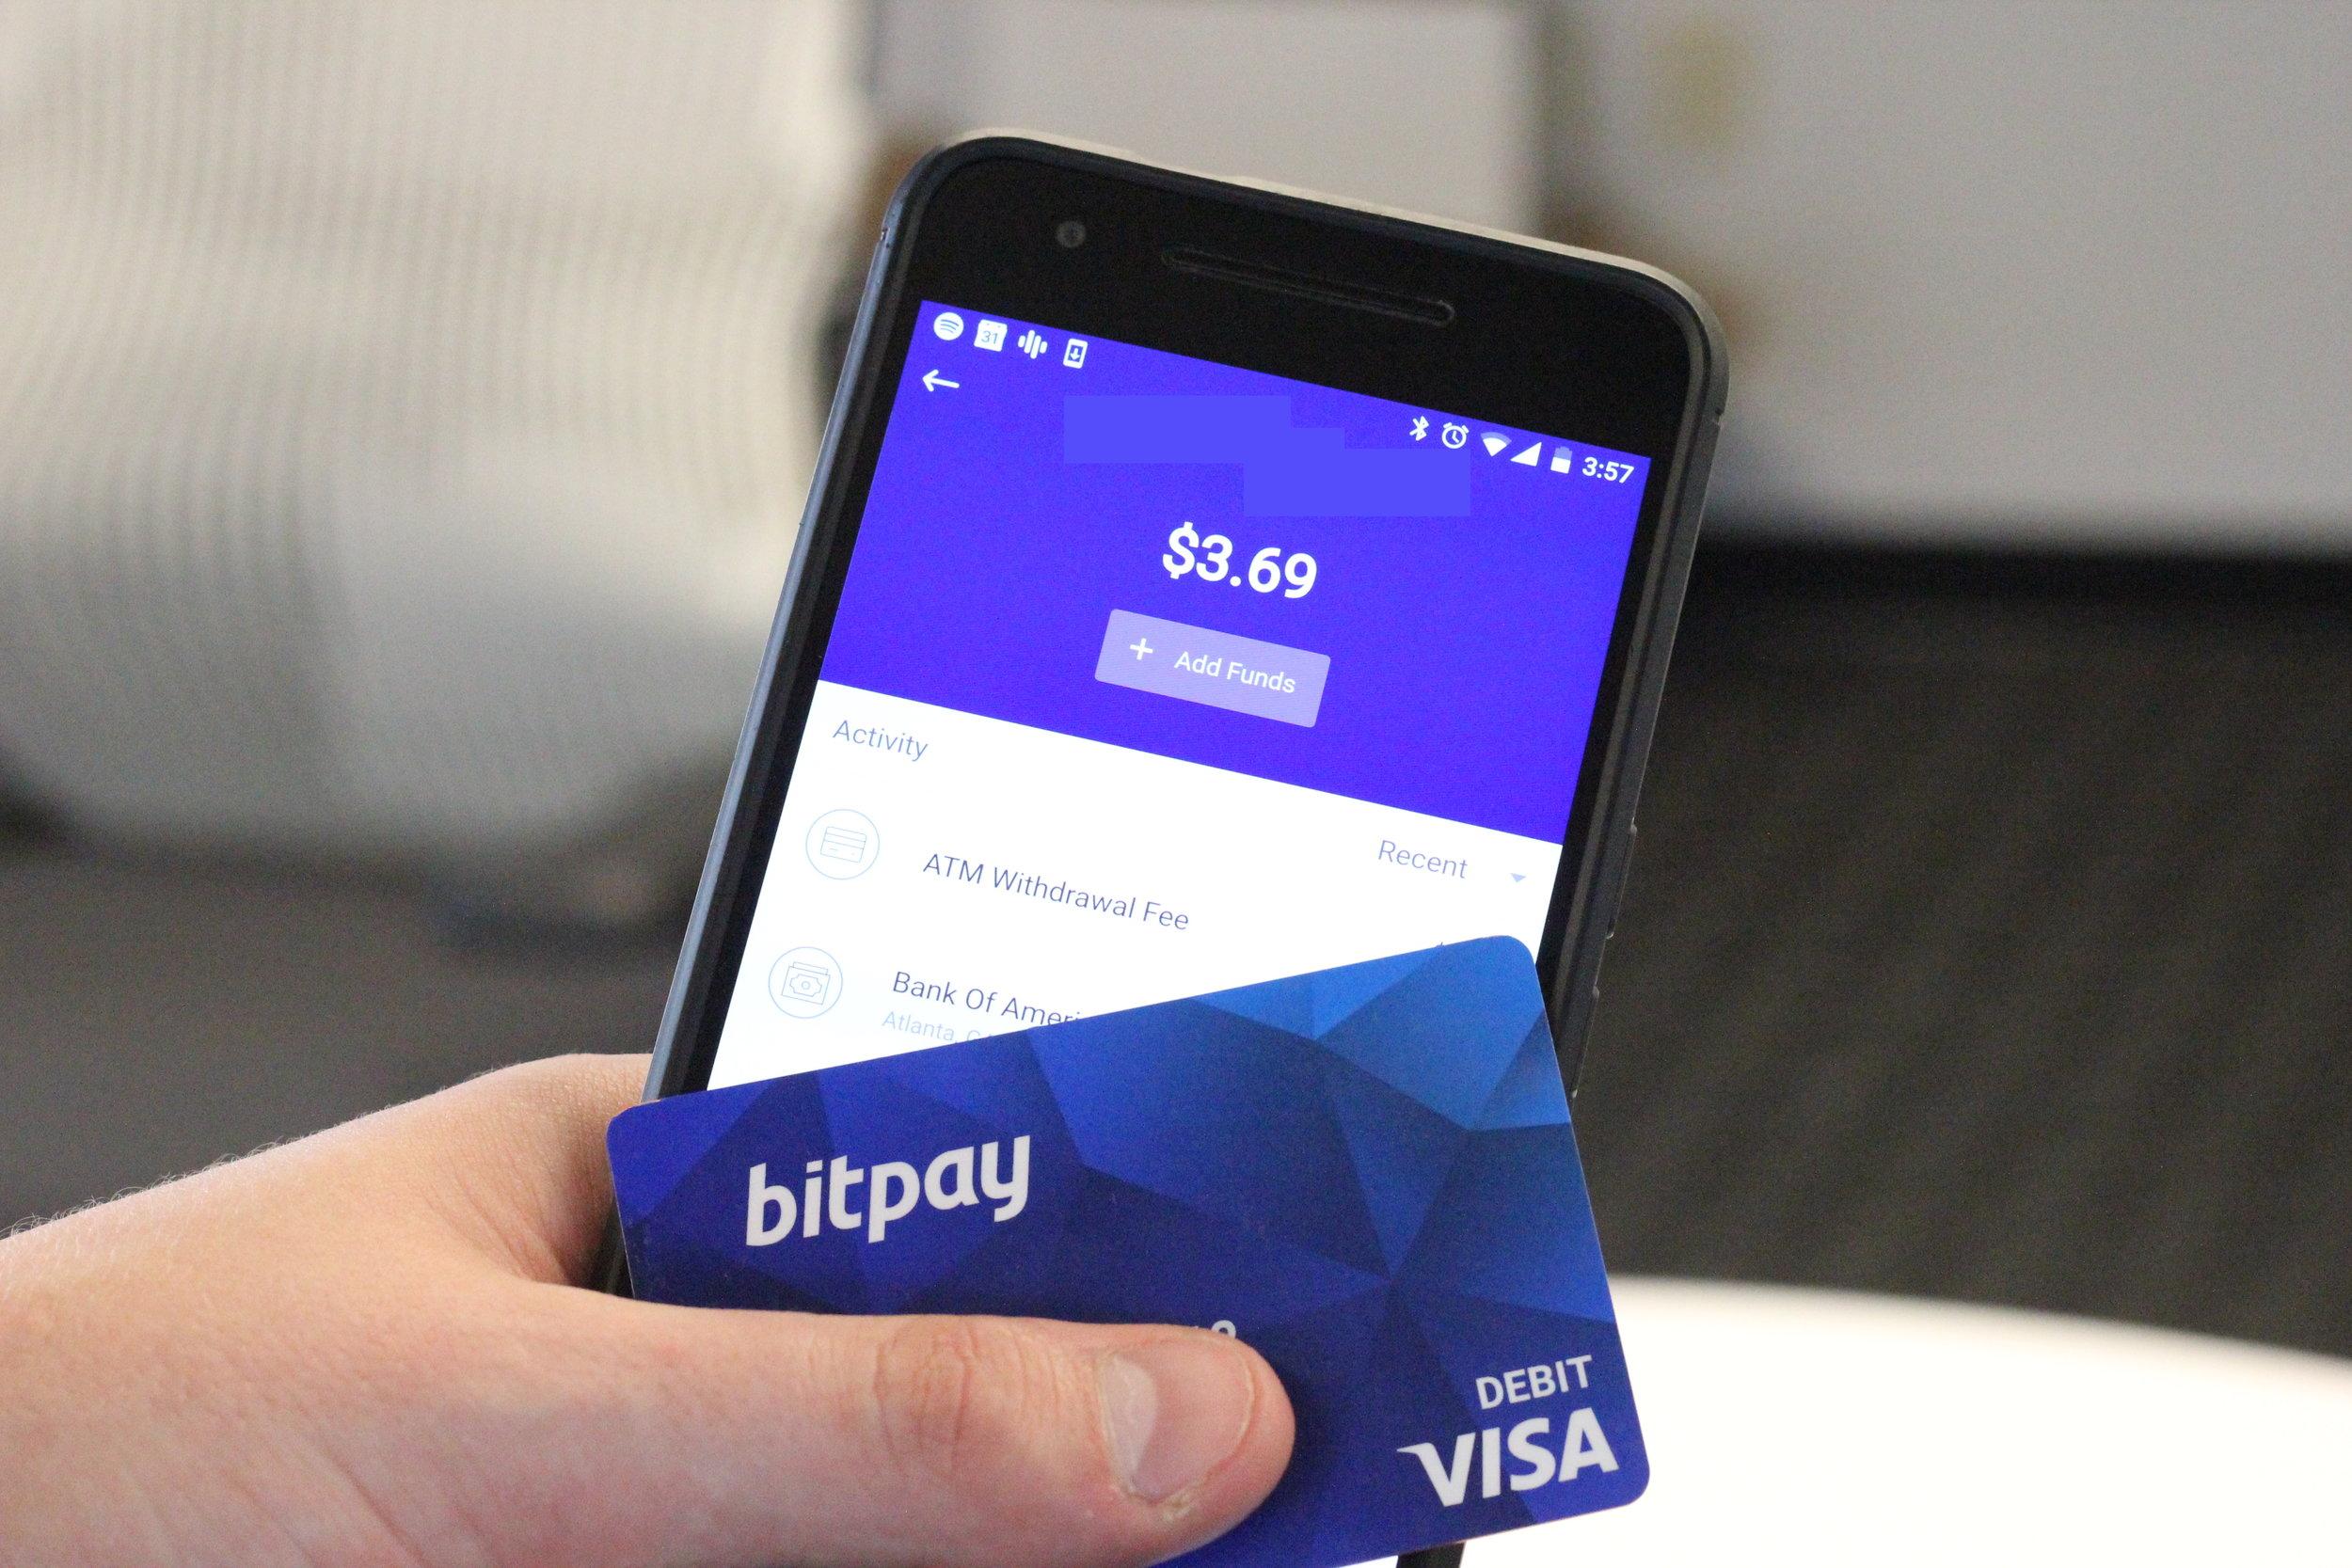 bitpay-app-card.JPG